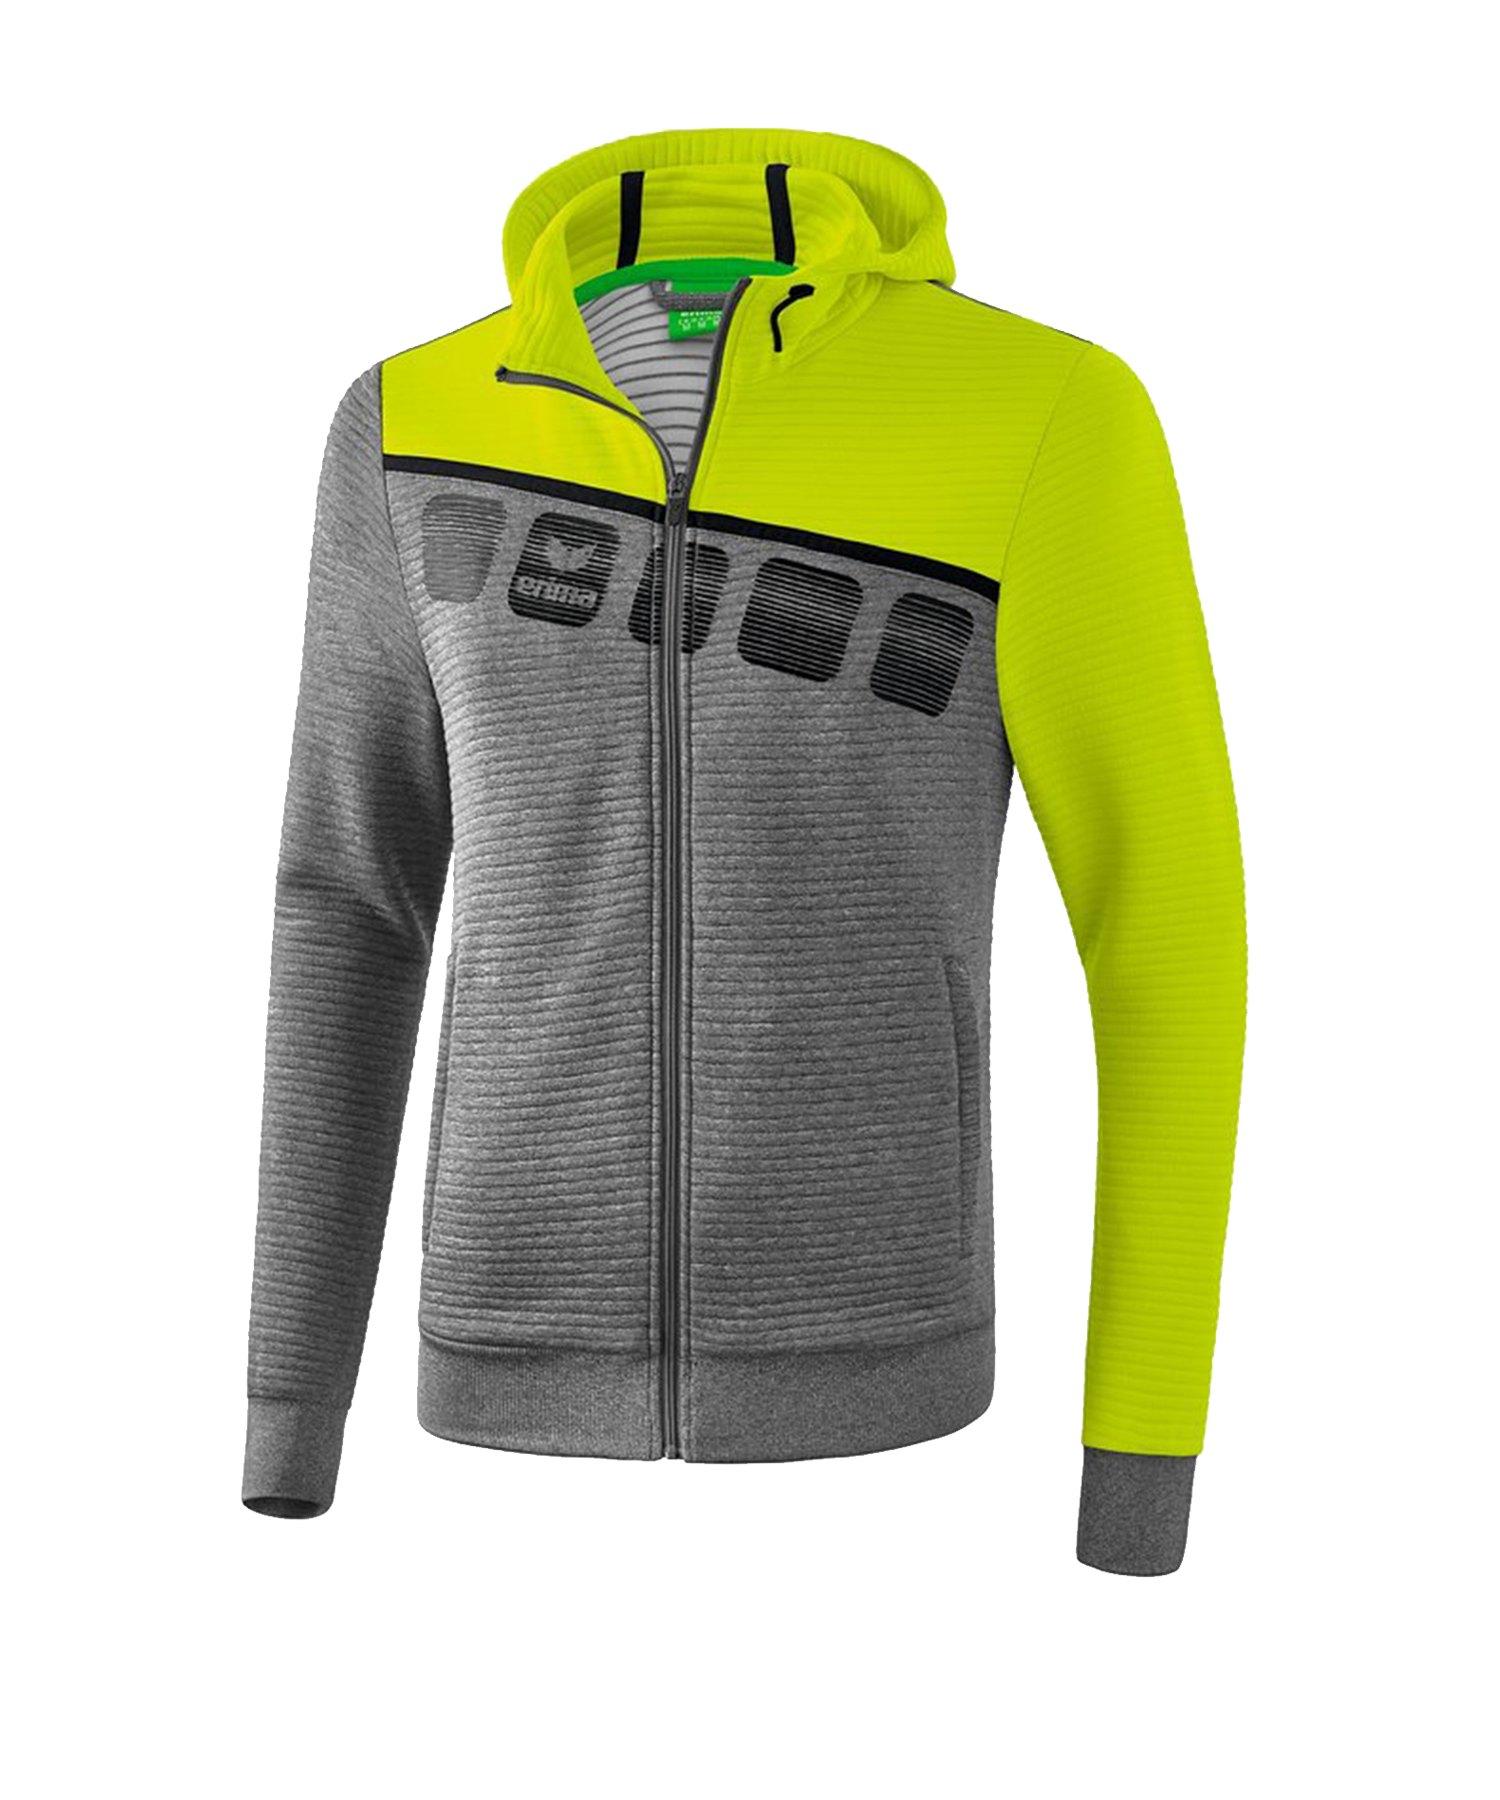 Erima 5-C Trainingsjacke mit Kapuze Grau Grün - Grau